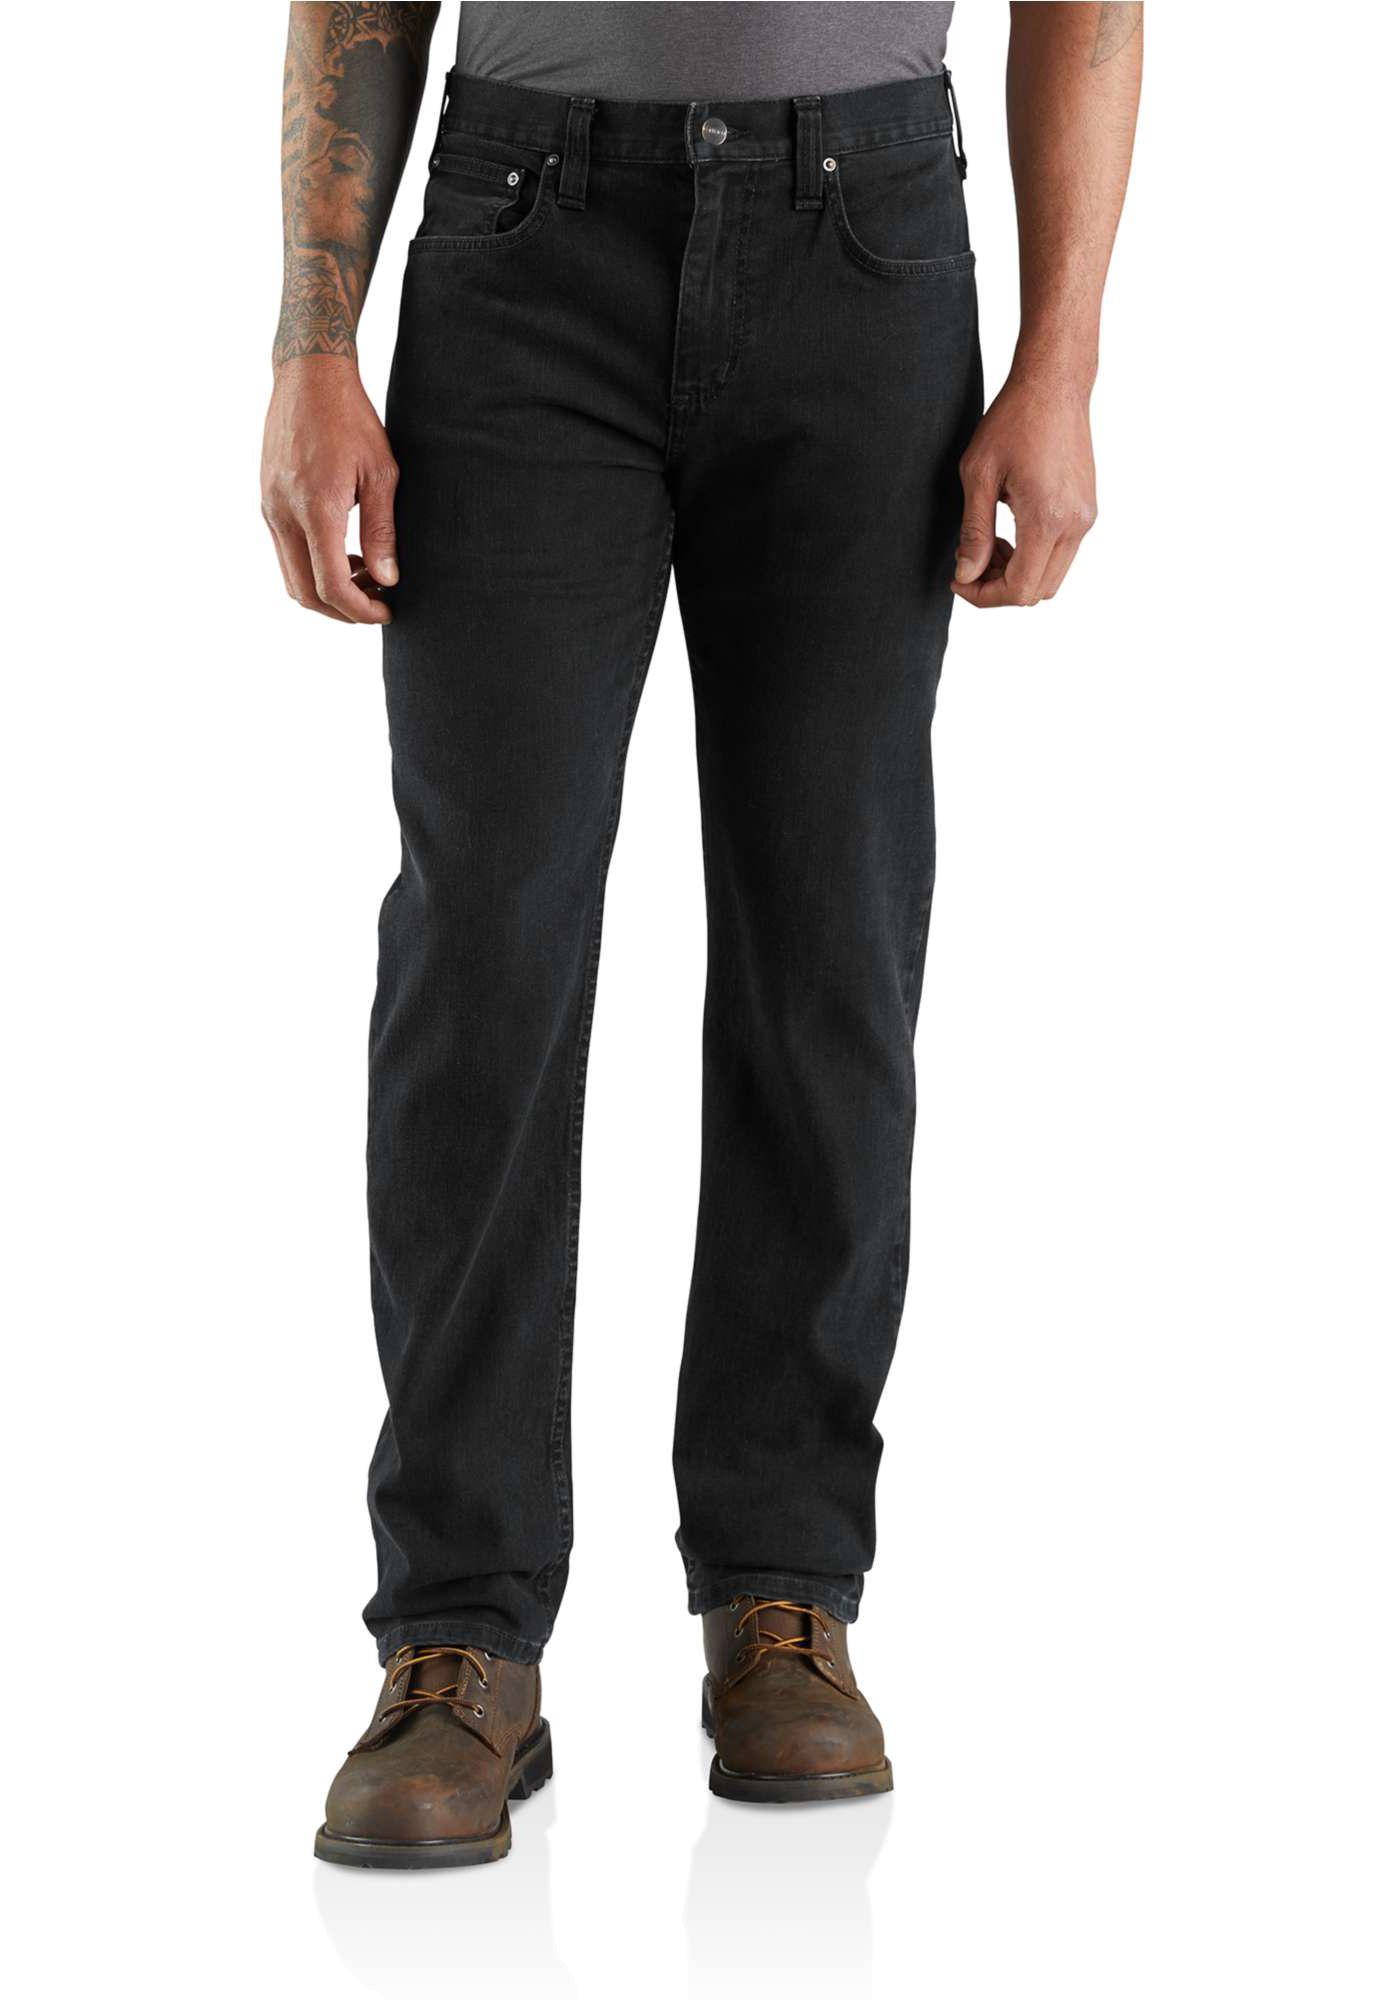 Carhartt Men's Rugged Flex Relaxed Fit Straight Leg Jeans